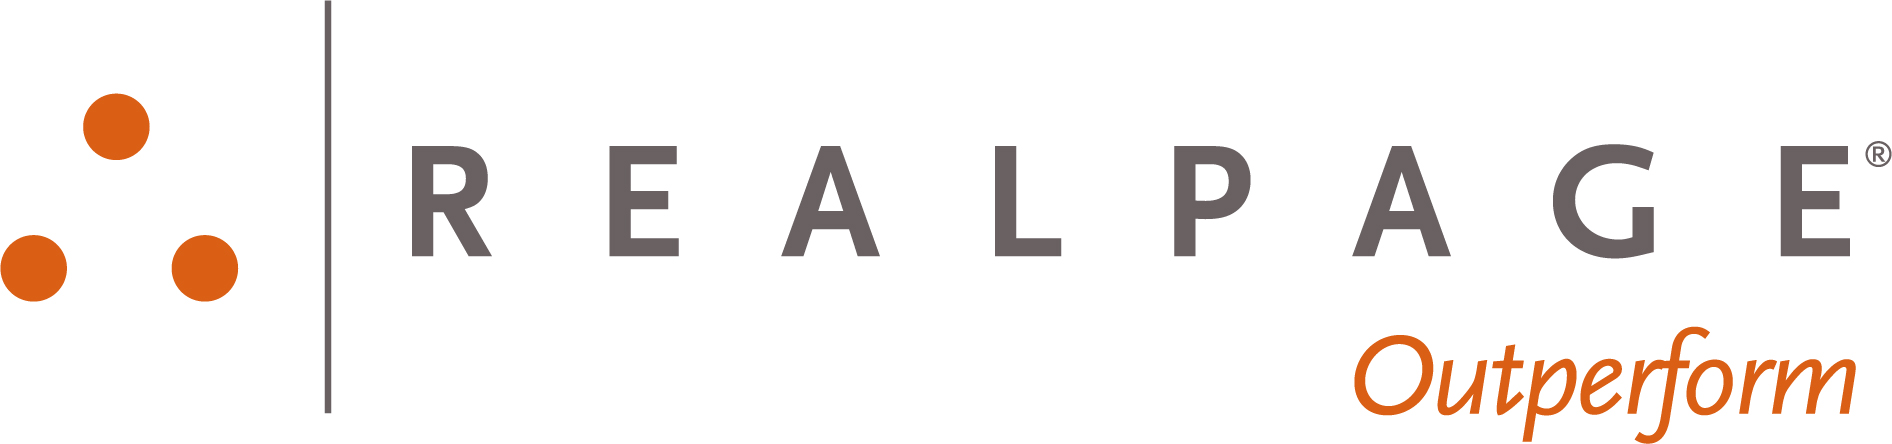 REALPAGE-LogoOutperform_4C-1 (4)